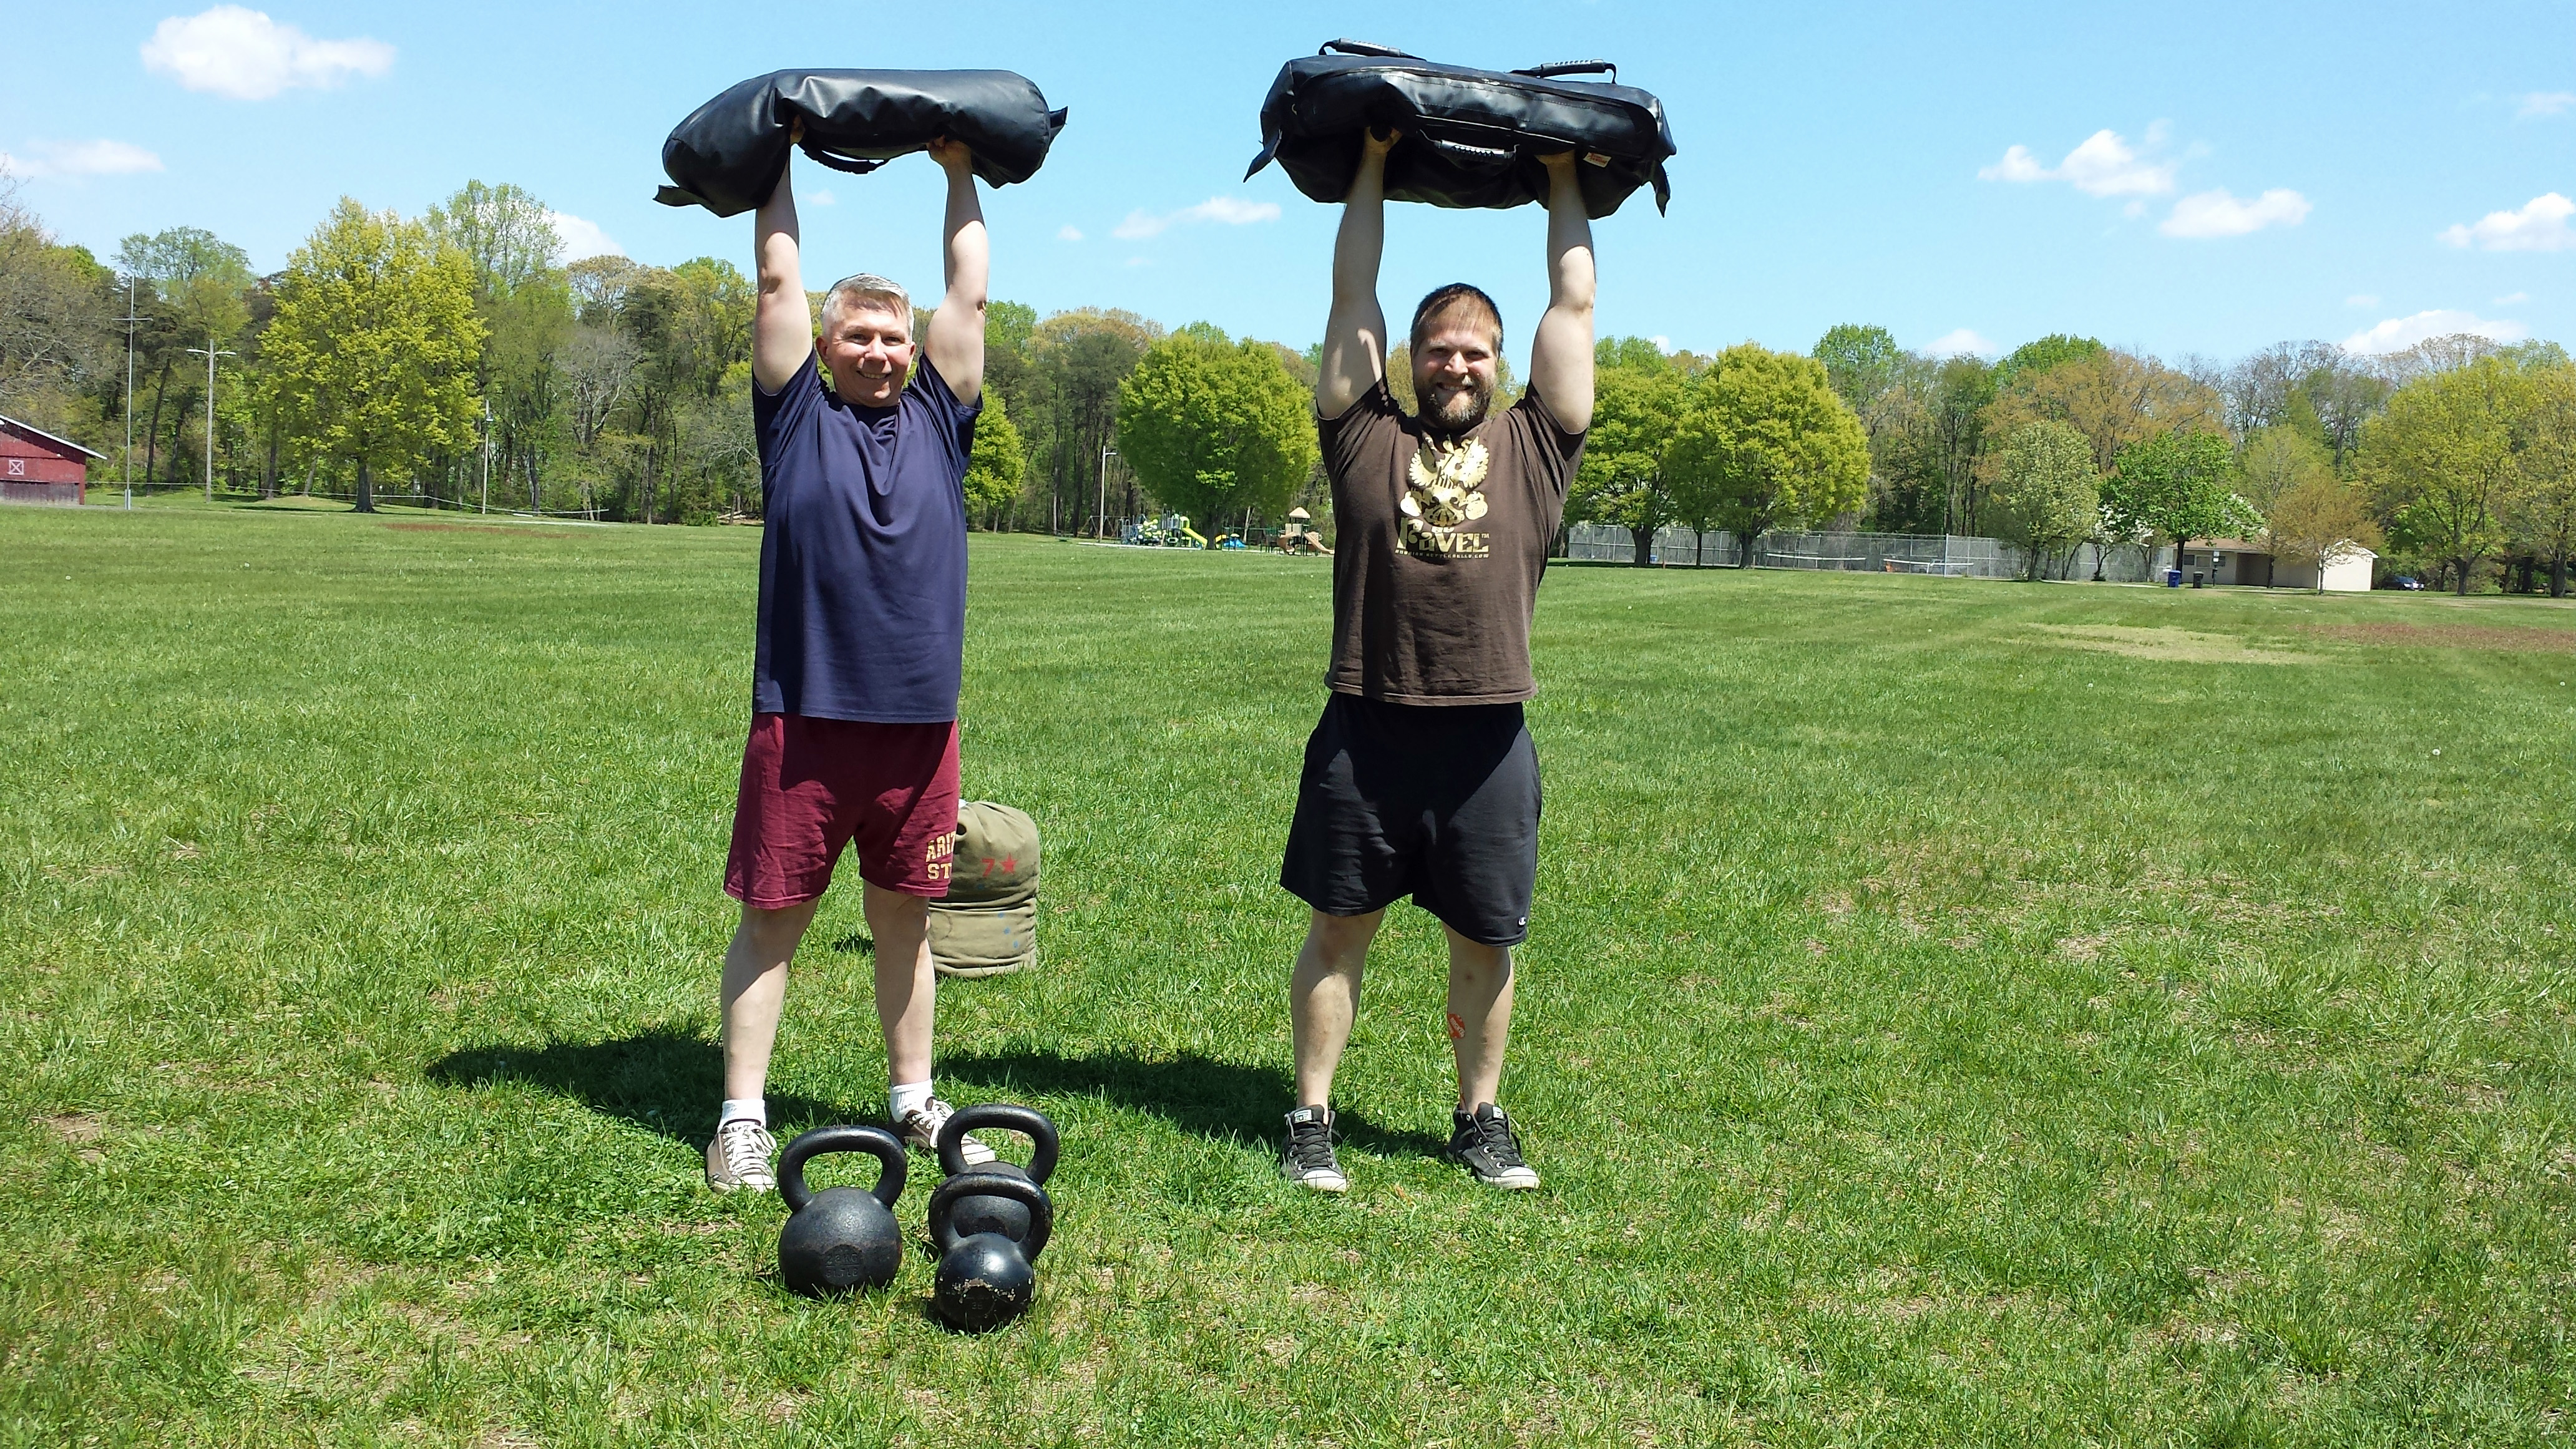 Sandbag And Kettlebell Walking Workout - Seven Stars Fitness